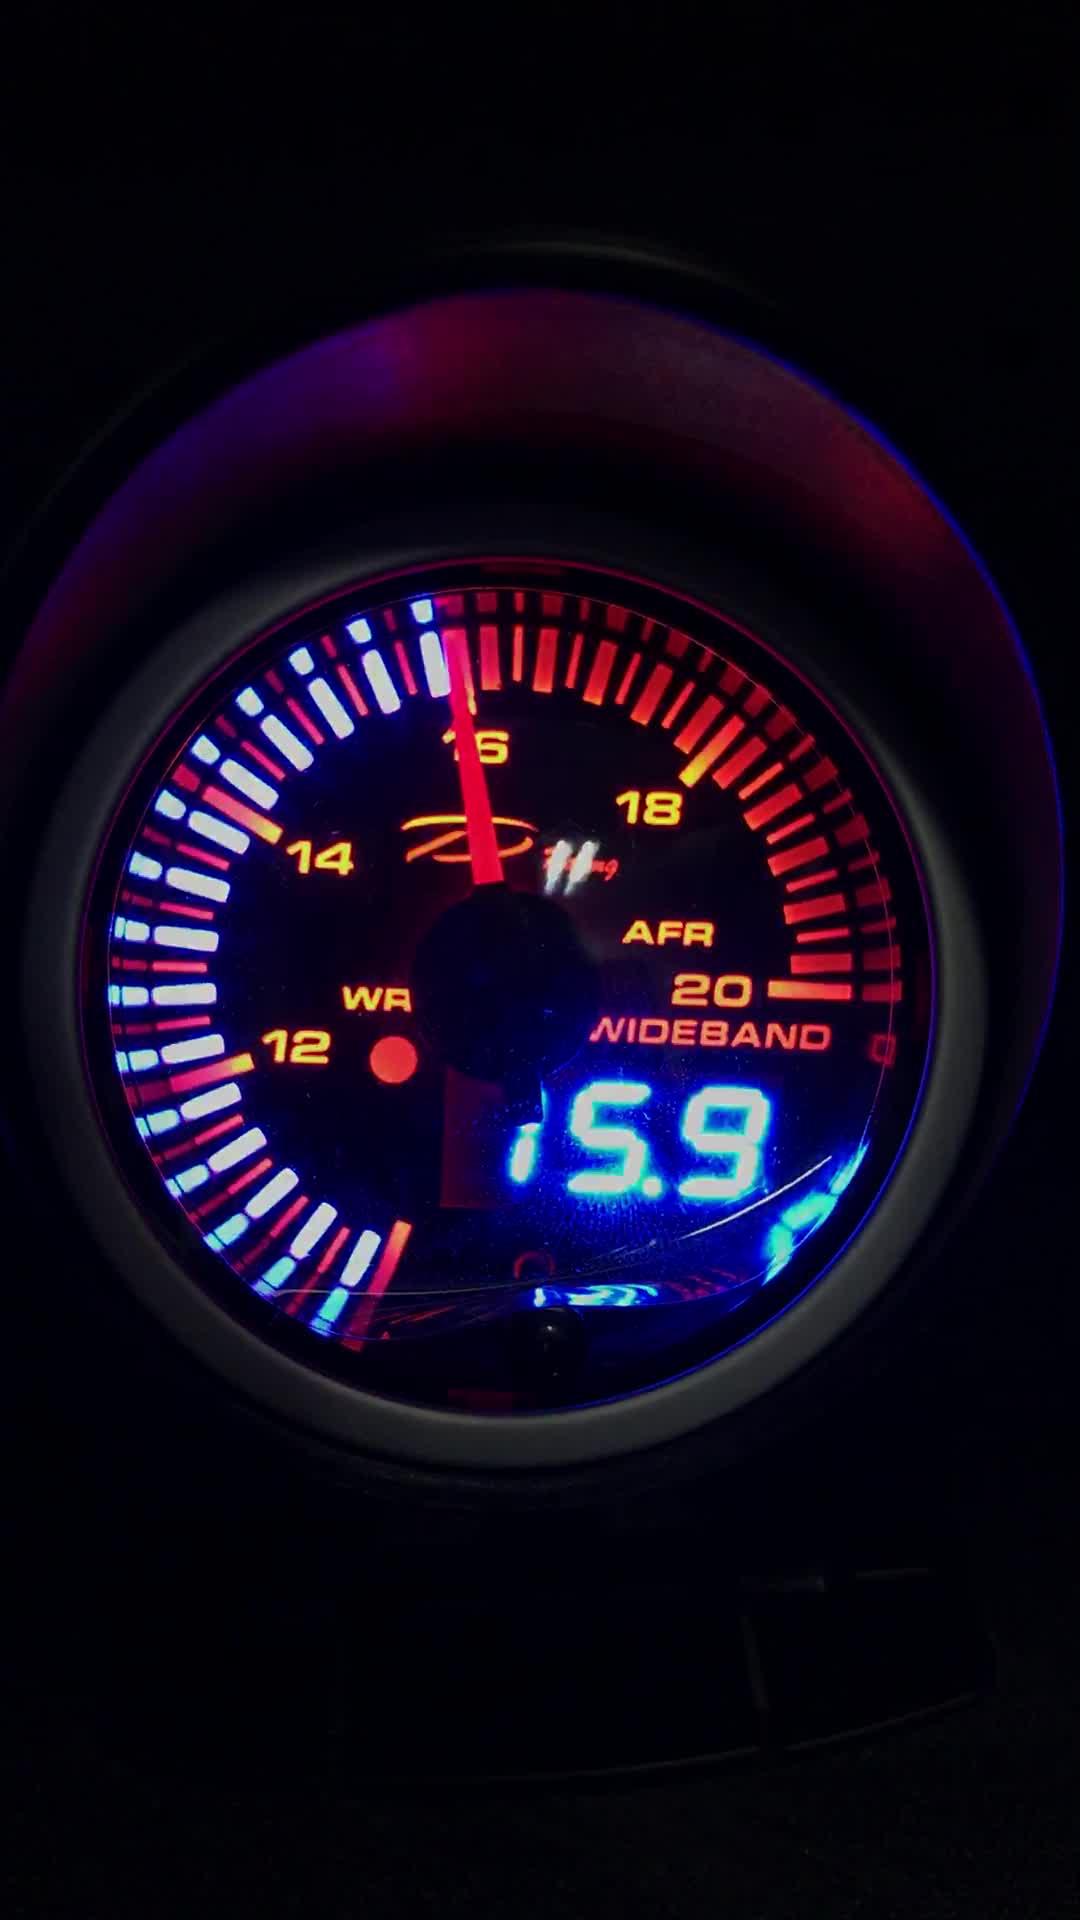 60mm SLD Easy Installation Analog + Digital gauge JDM full set with waterproof sensor Auto Gauge Boost Turbo Gauge